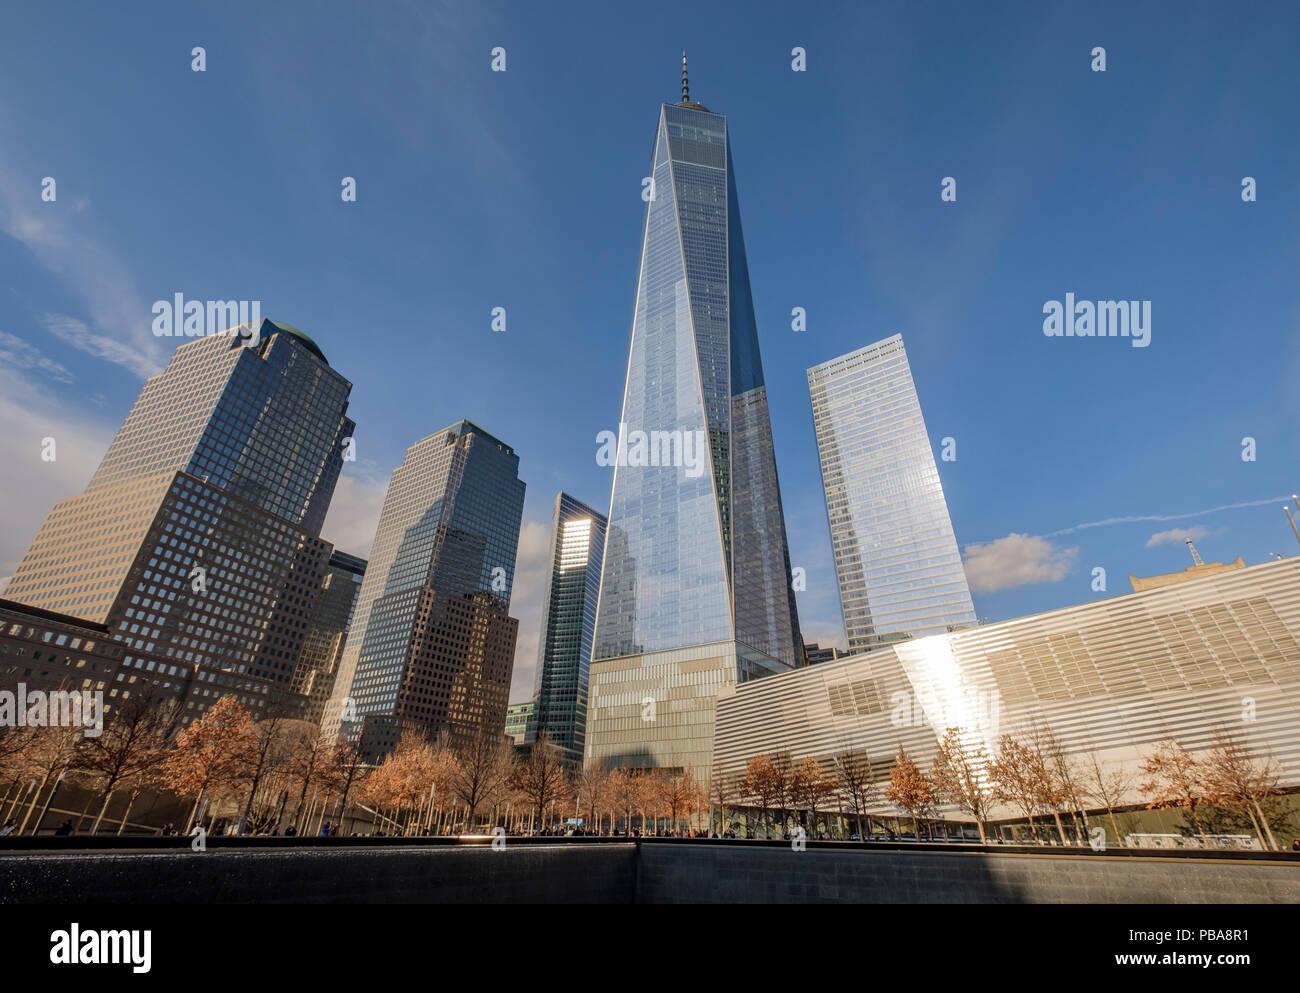 One World Trade Center, building, New York, building, Feb 11, 2017. (CTK Photo/Vladimir Houdek) - Stock Image